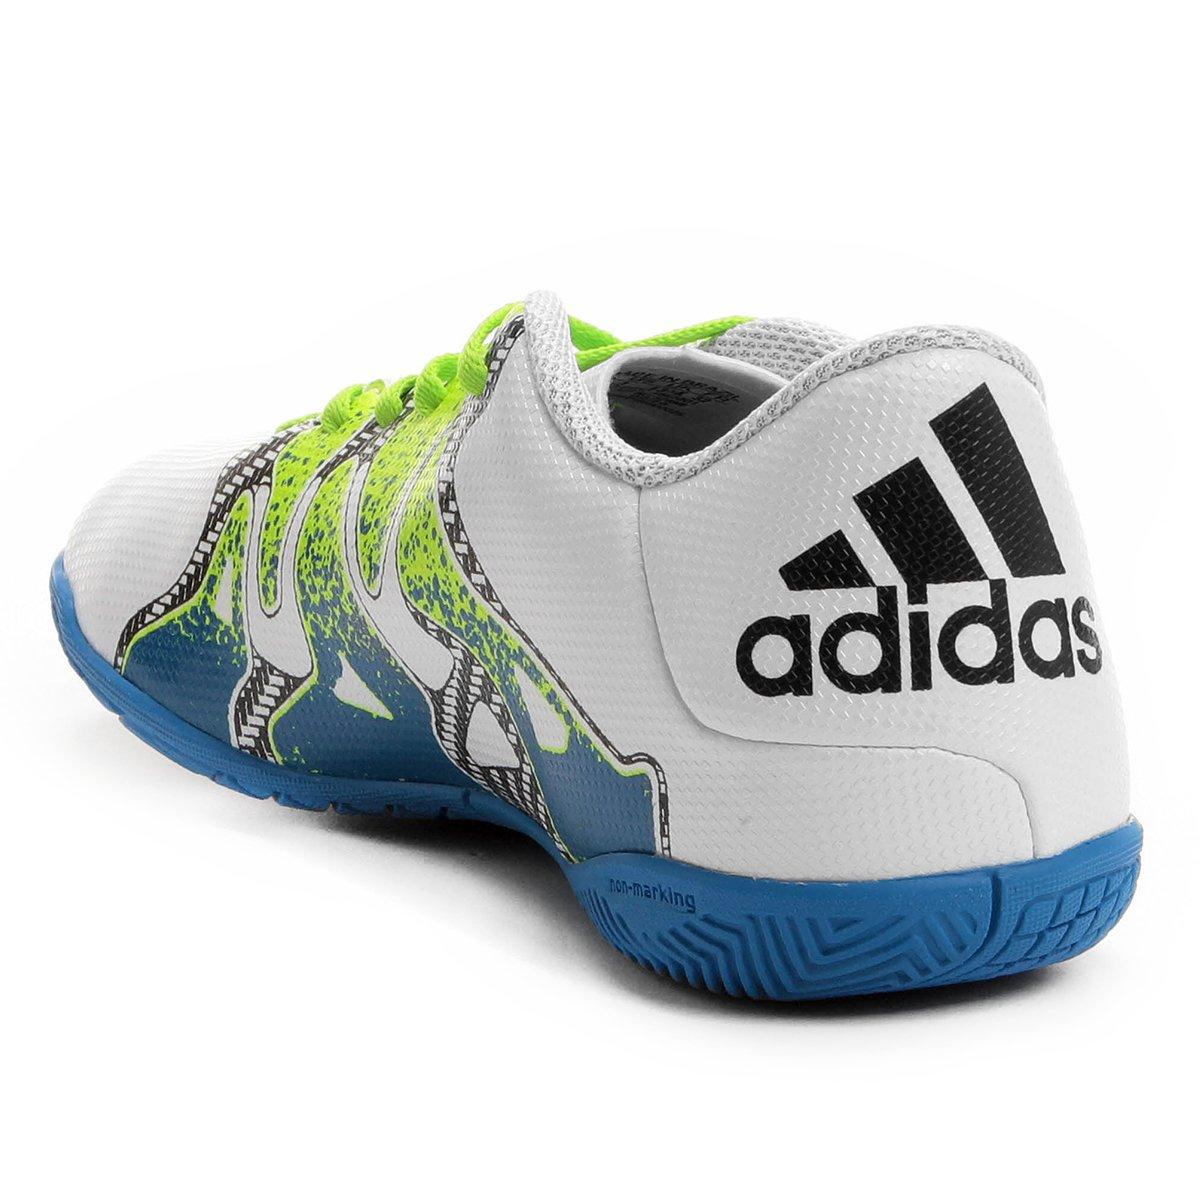 Chuteira Futsal Juvenil Adidas X 15.4 IN - Branco e Verde - Compre ... 446cdd42401b5